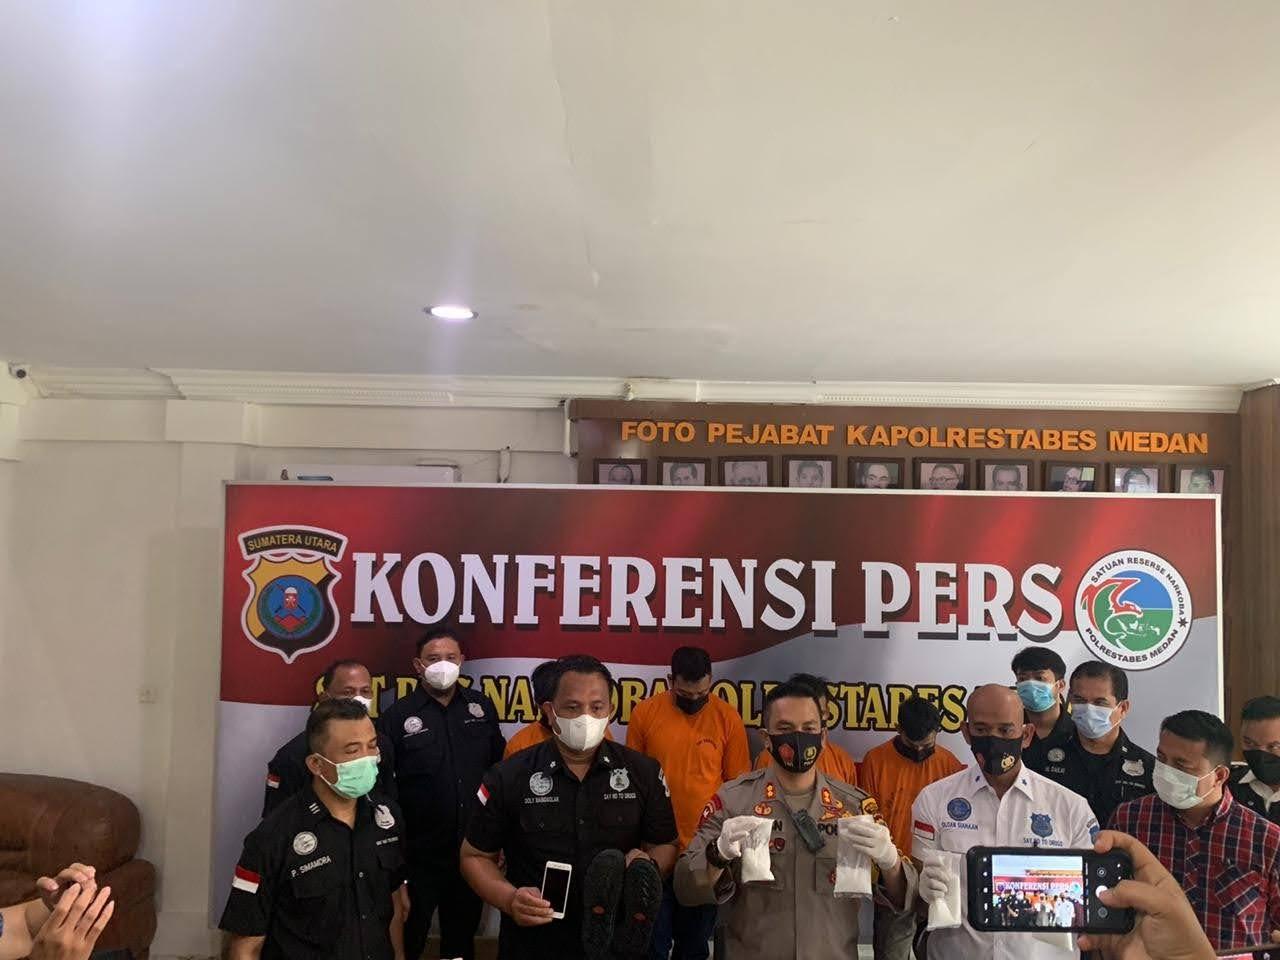 SatNarkoba Polrestabes Medan Ciduk 4 Pria Pengedar Narkoba Asal Aceh